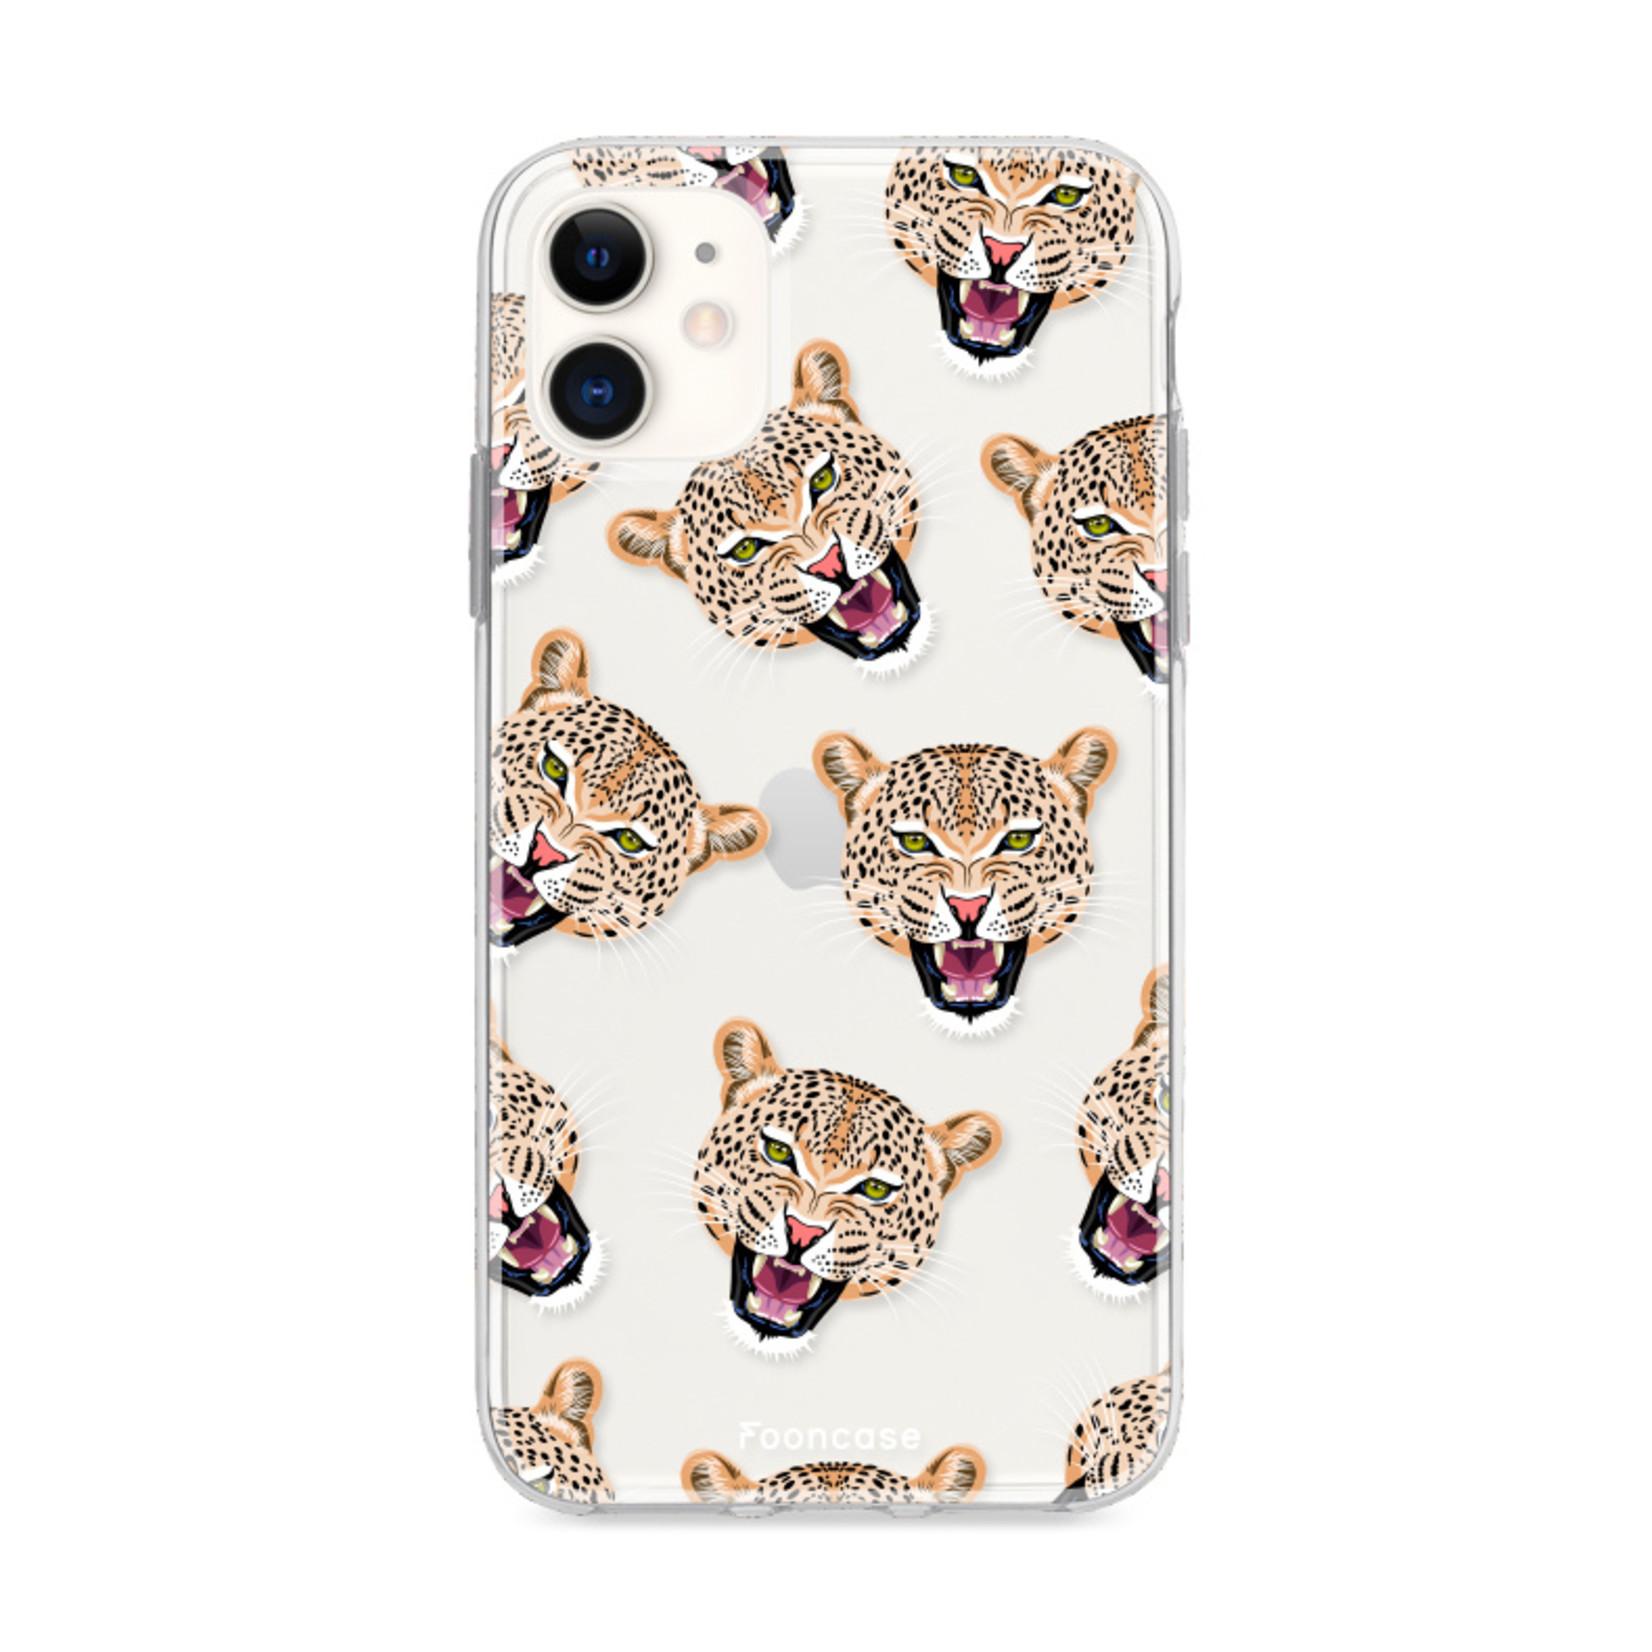 FOONCASE iPhone 11 hoesje TPU Soft Case - Back Cover - Cheeky Leopard / Luipaard hoofden